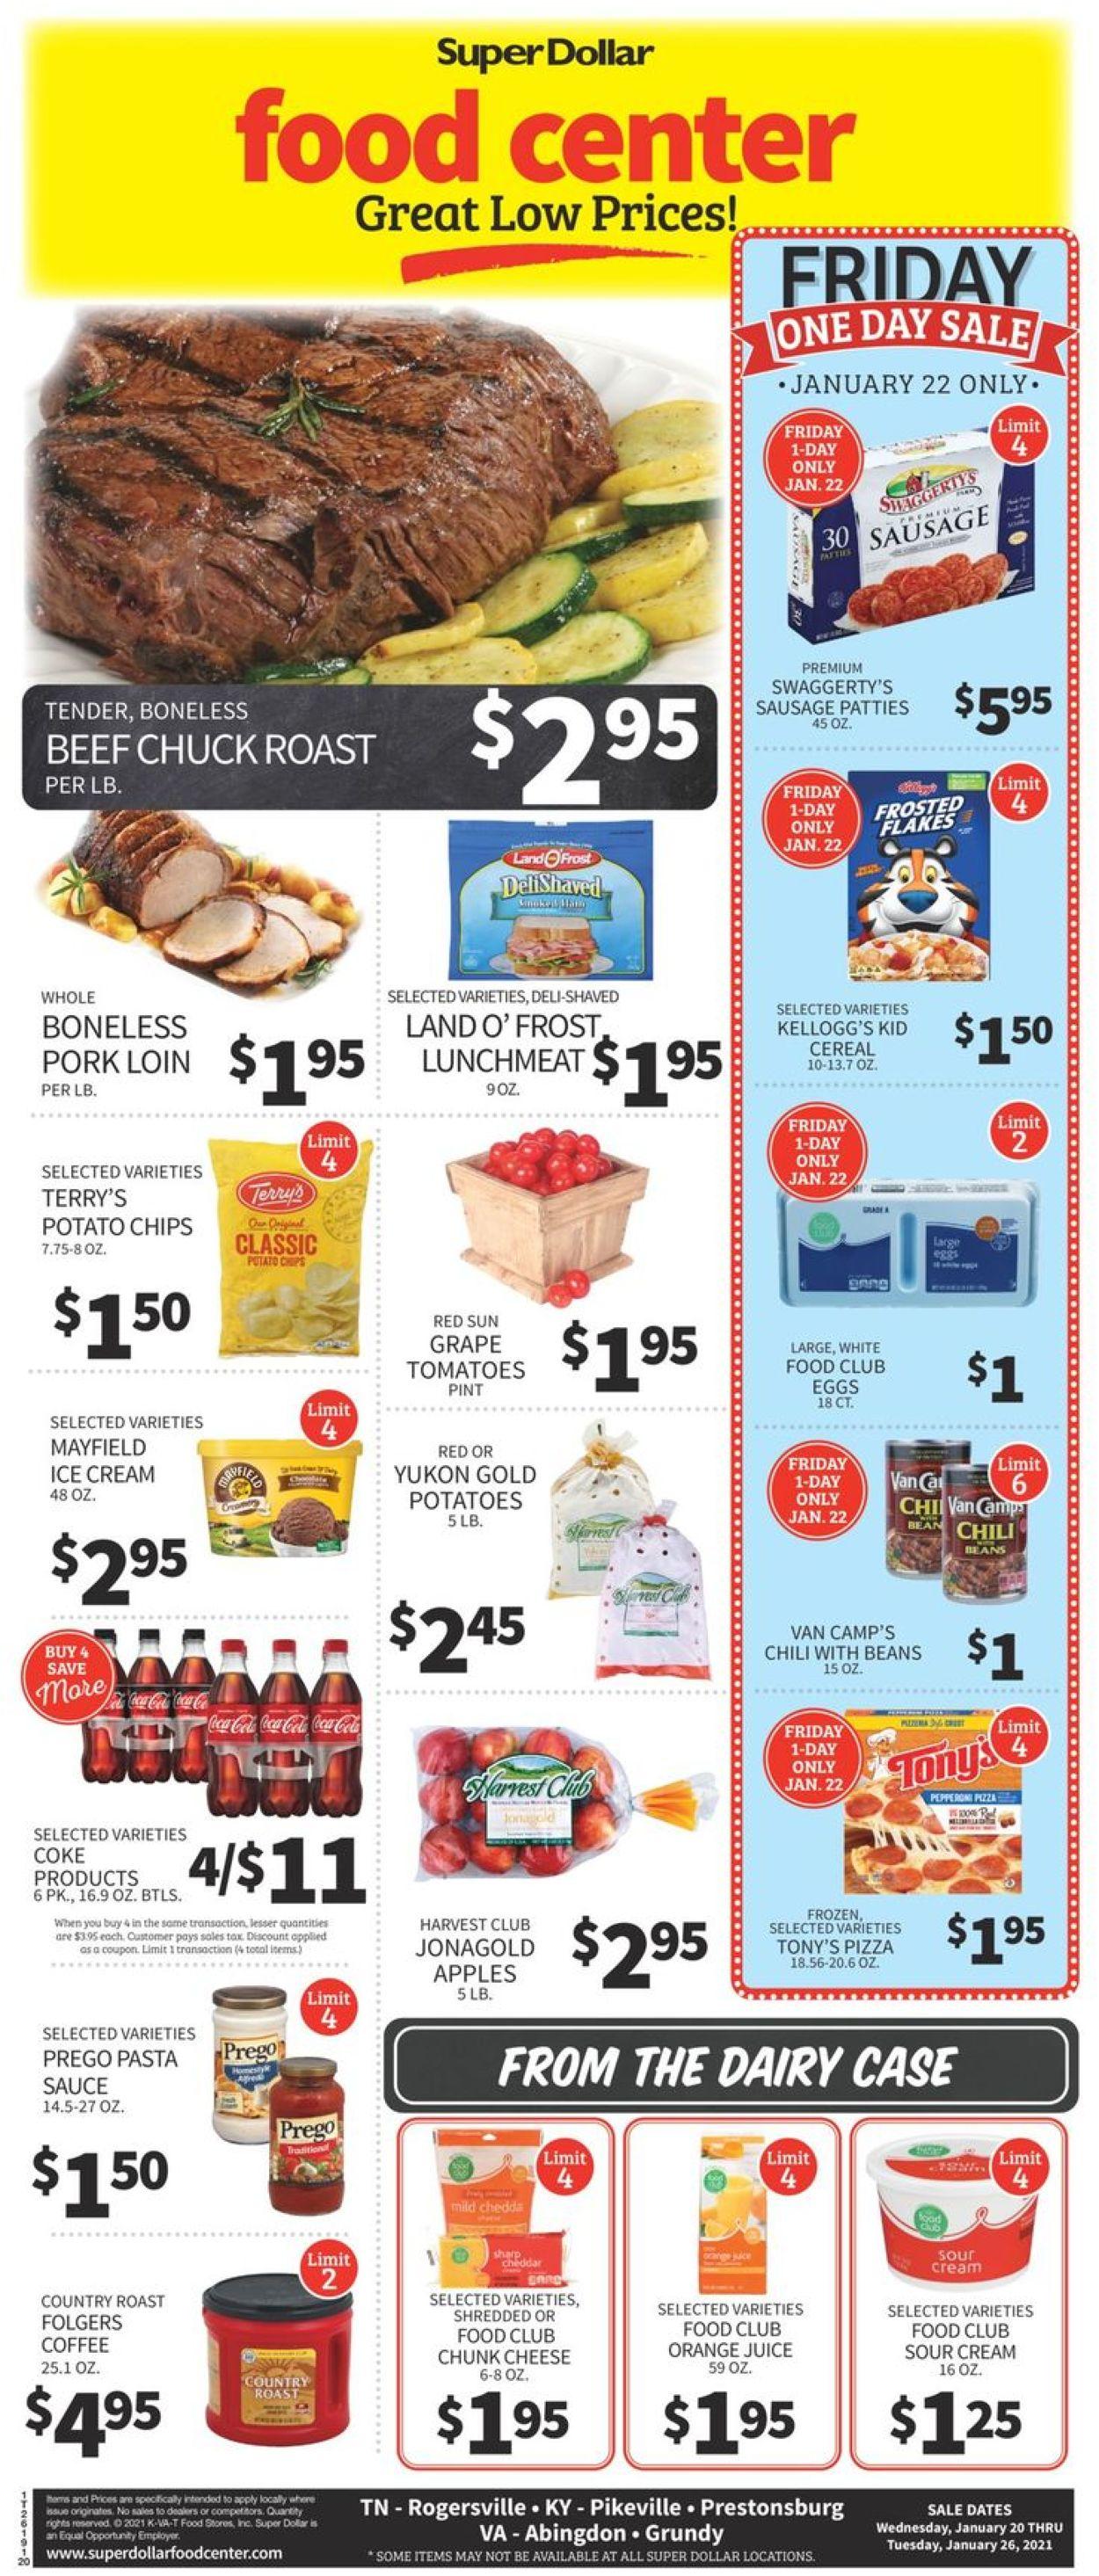 Super Dollar Food Center Weekly Ad Circular - valid 01/20-01/26/2021